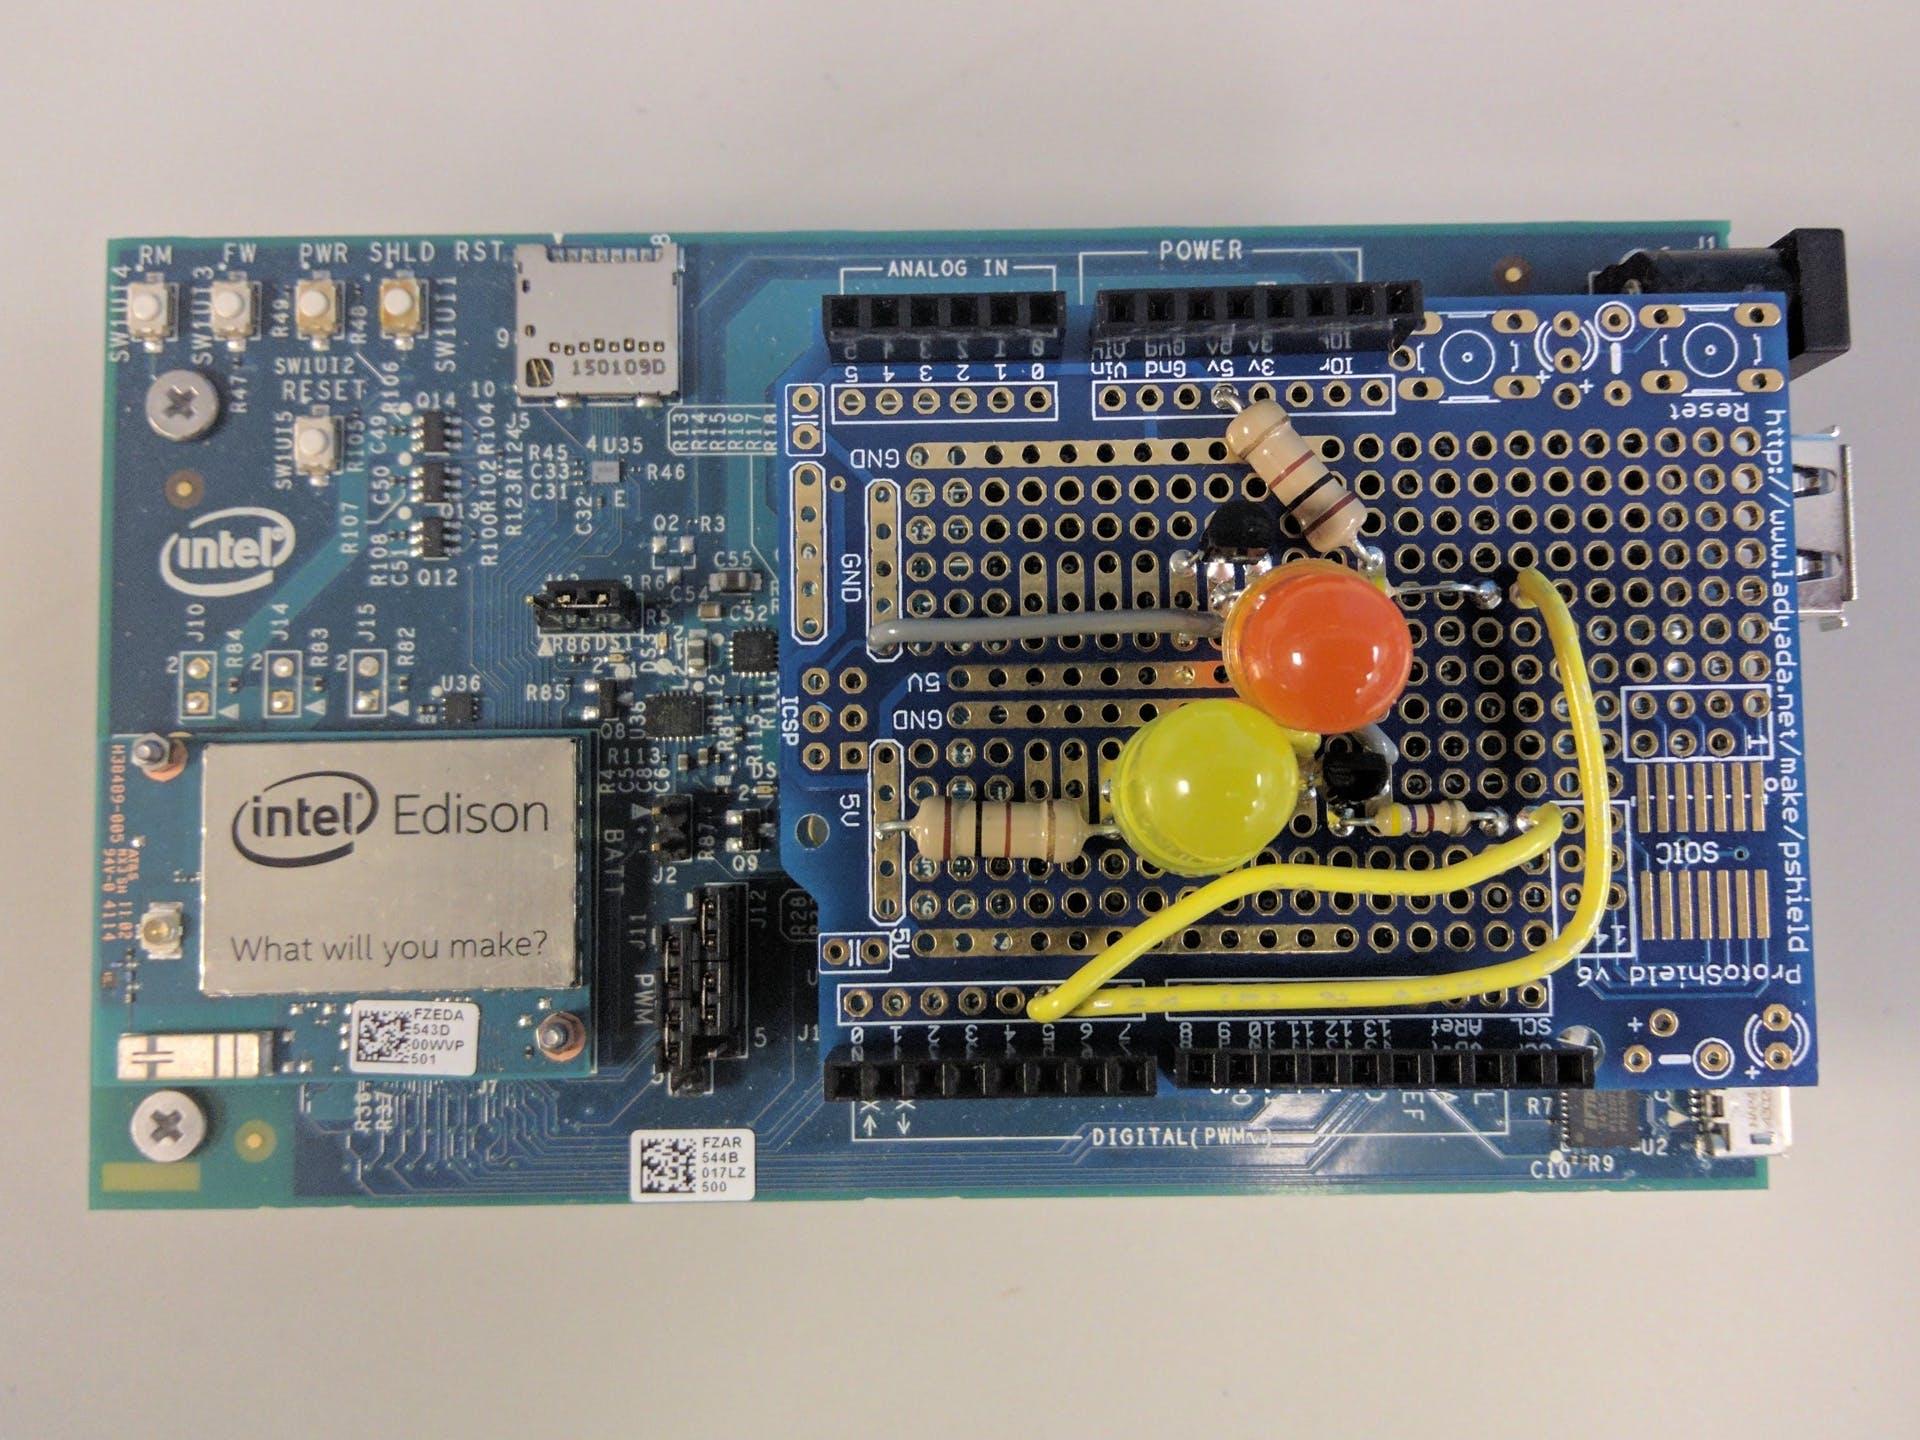 Prototype using a developer kit